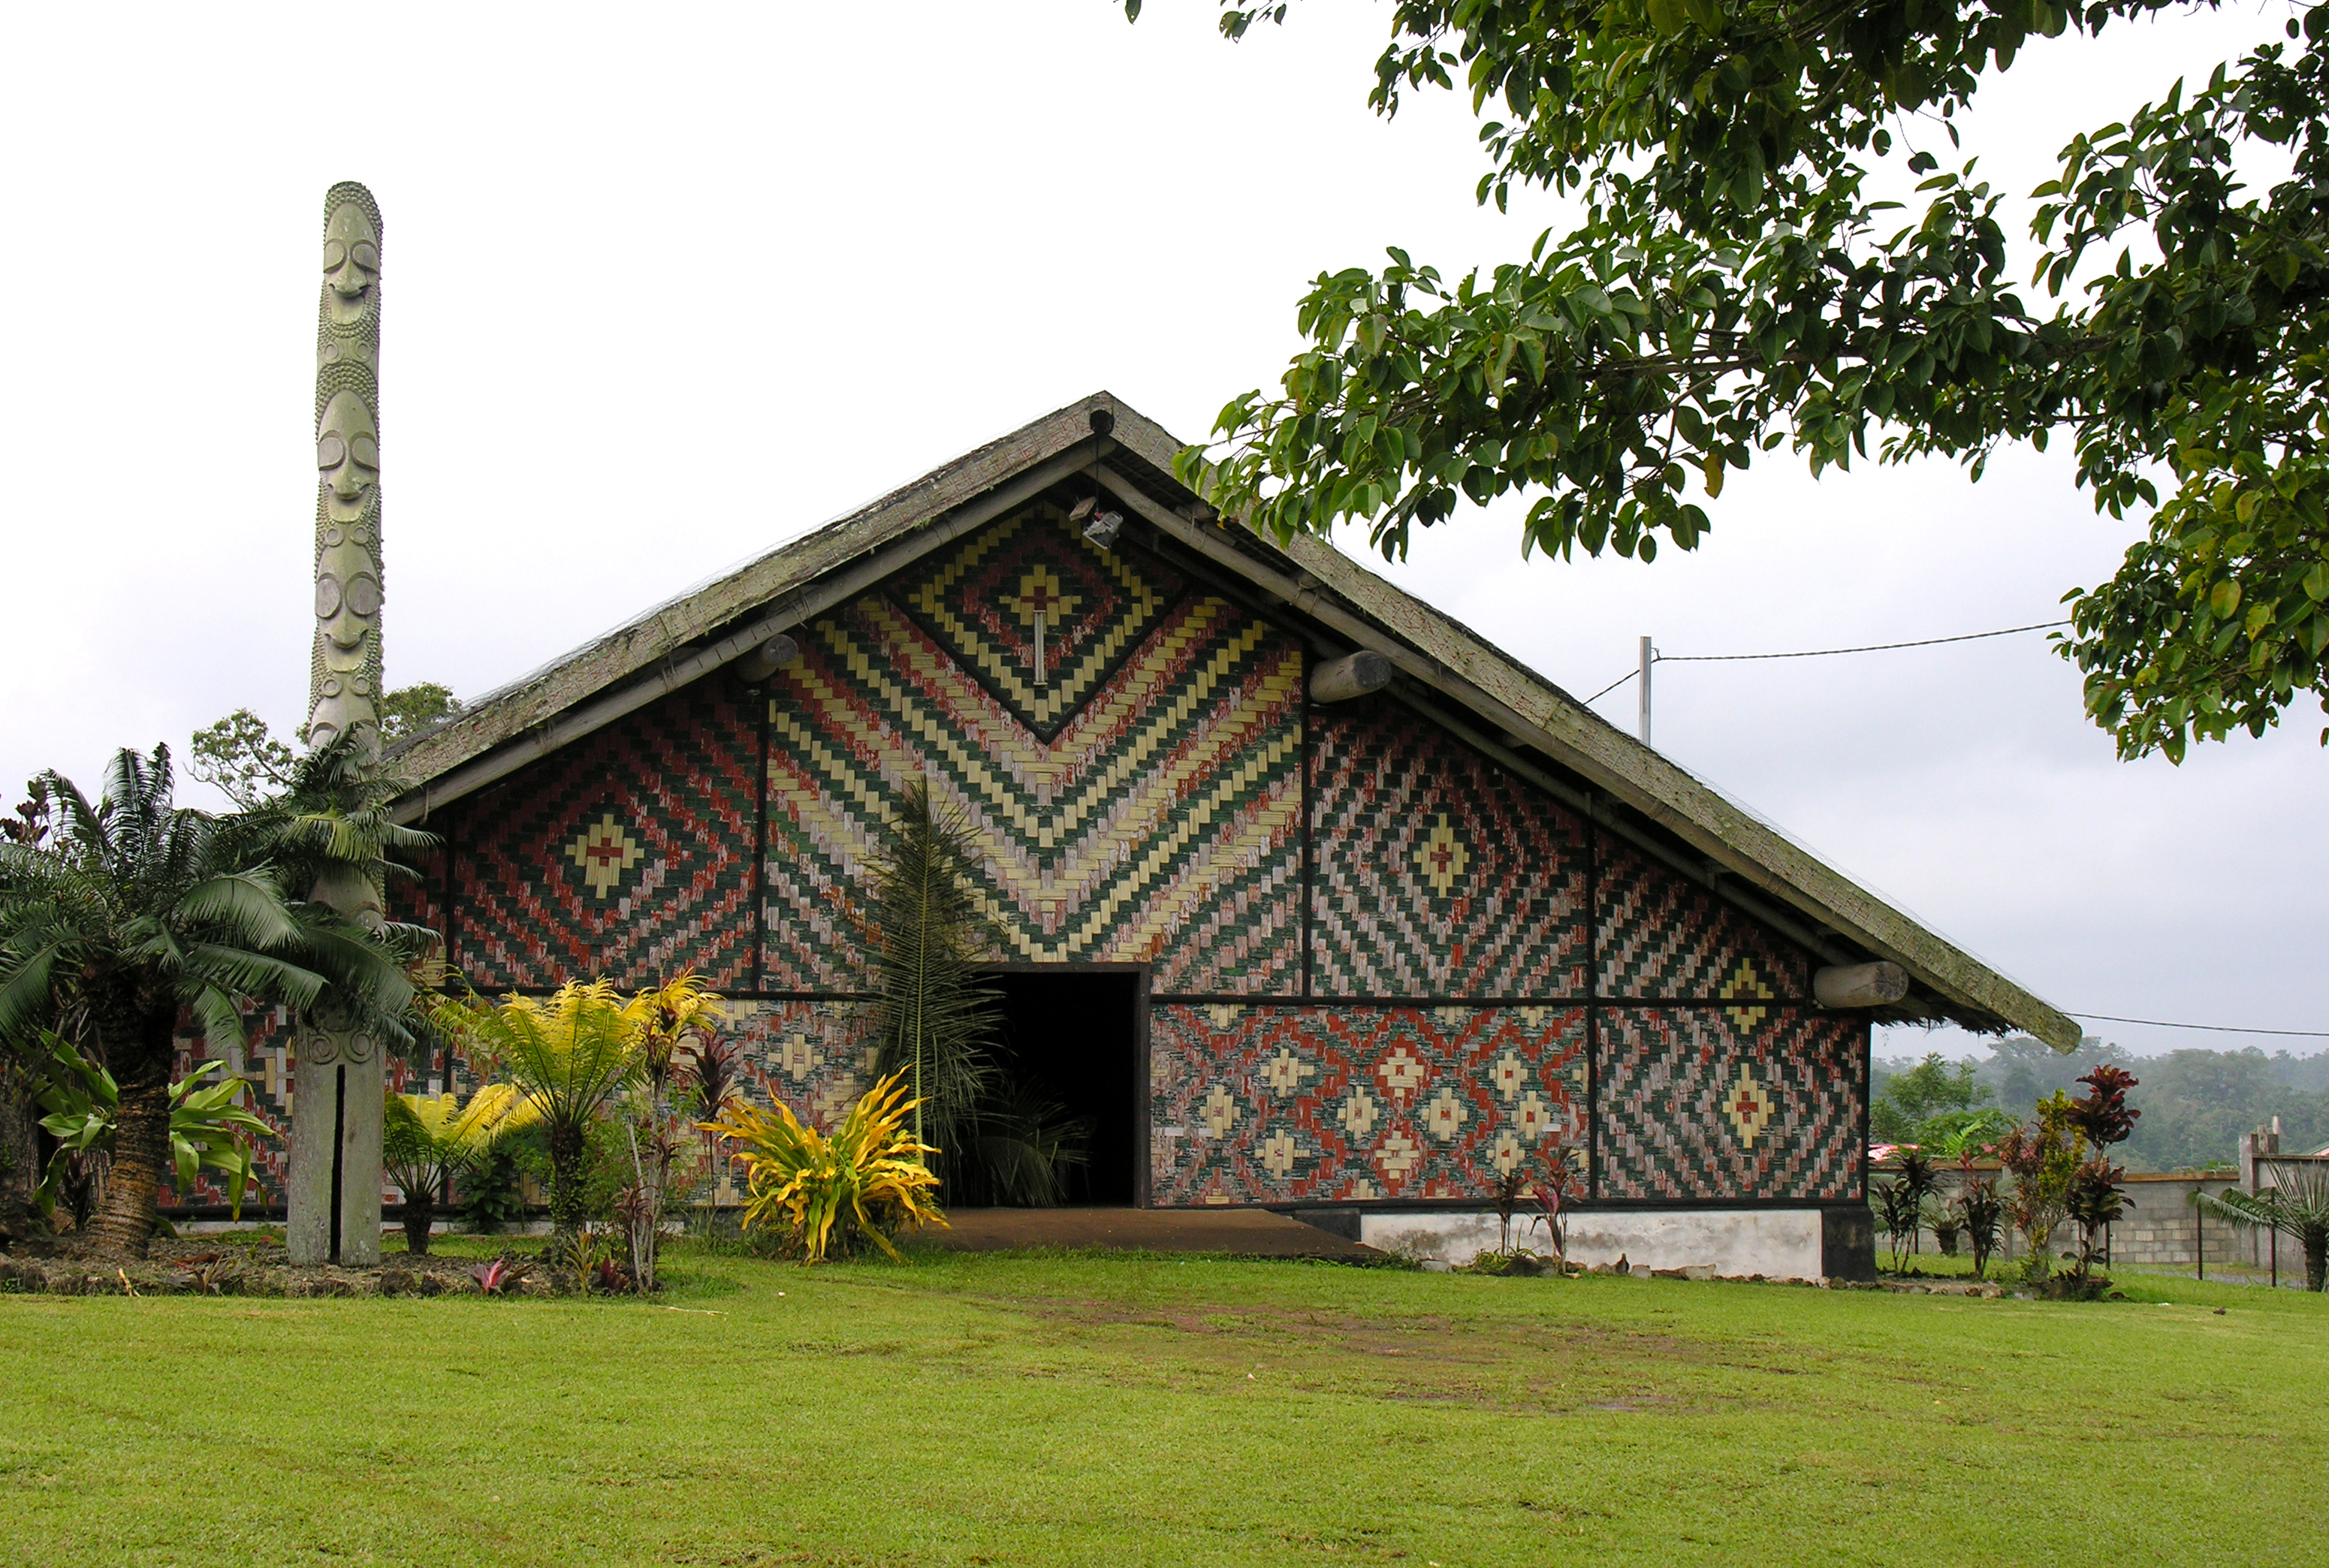 http://upload.wikimedia.org/wikipedia/commons/b/b3/National_Council_of_Chiefs%2C_Vanuatu.jpg